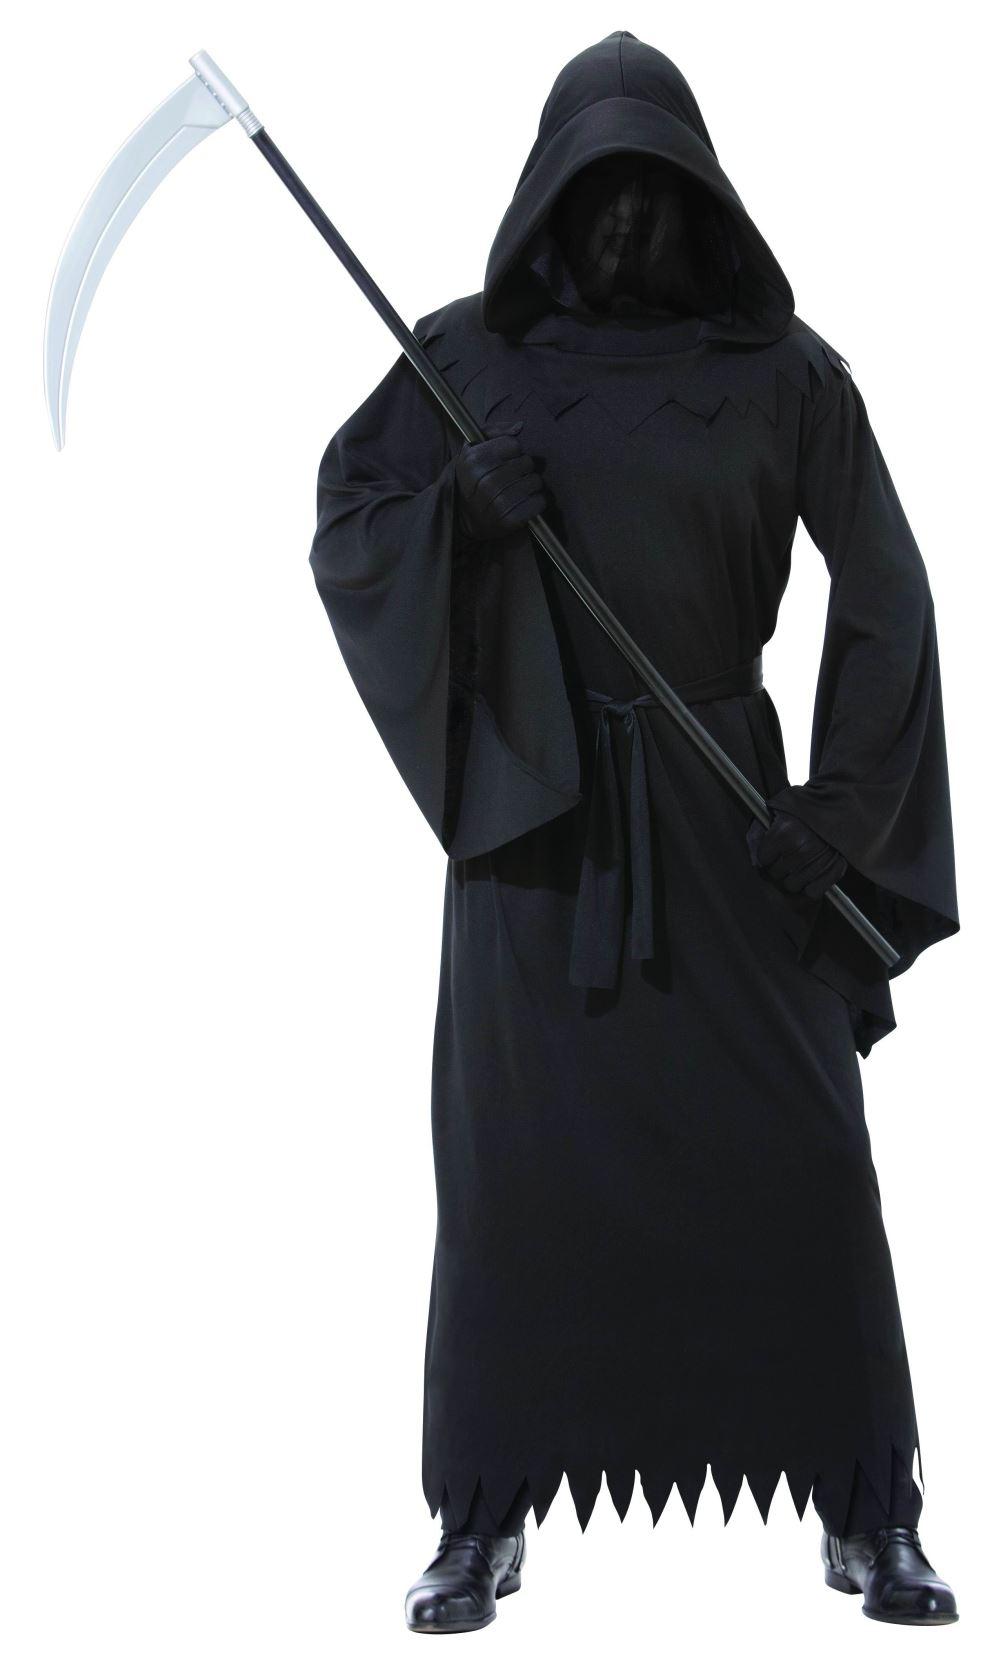 SALE HALLOWEEN GRIM REAPER SCARY Robe cloak with sleeves//Fancy Dress//Theatre